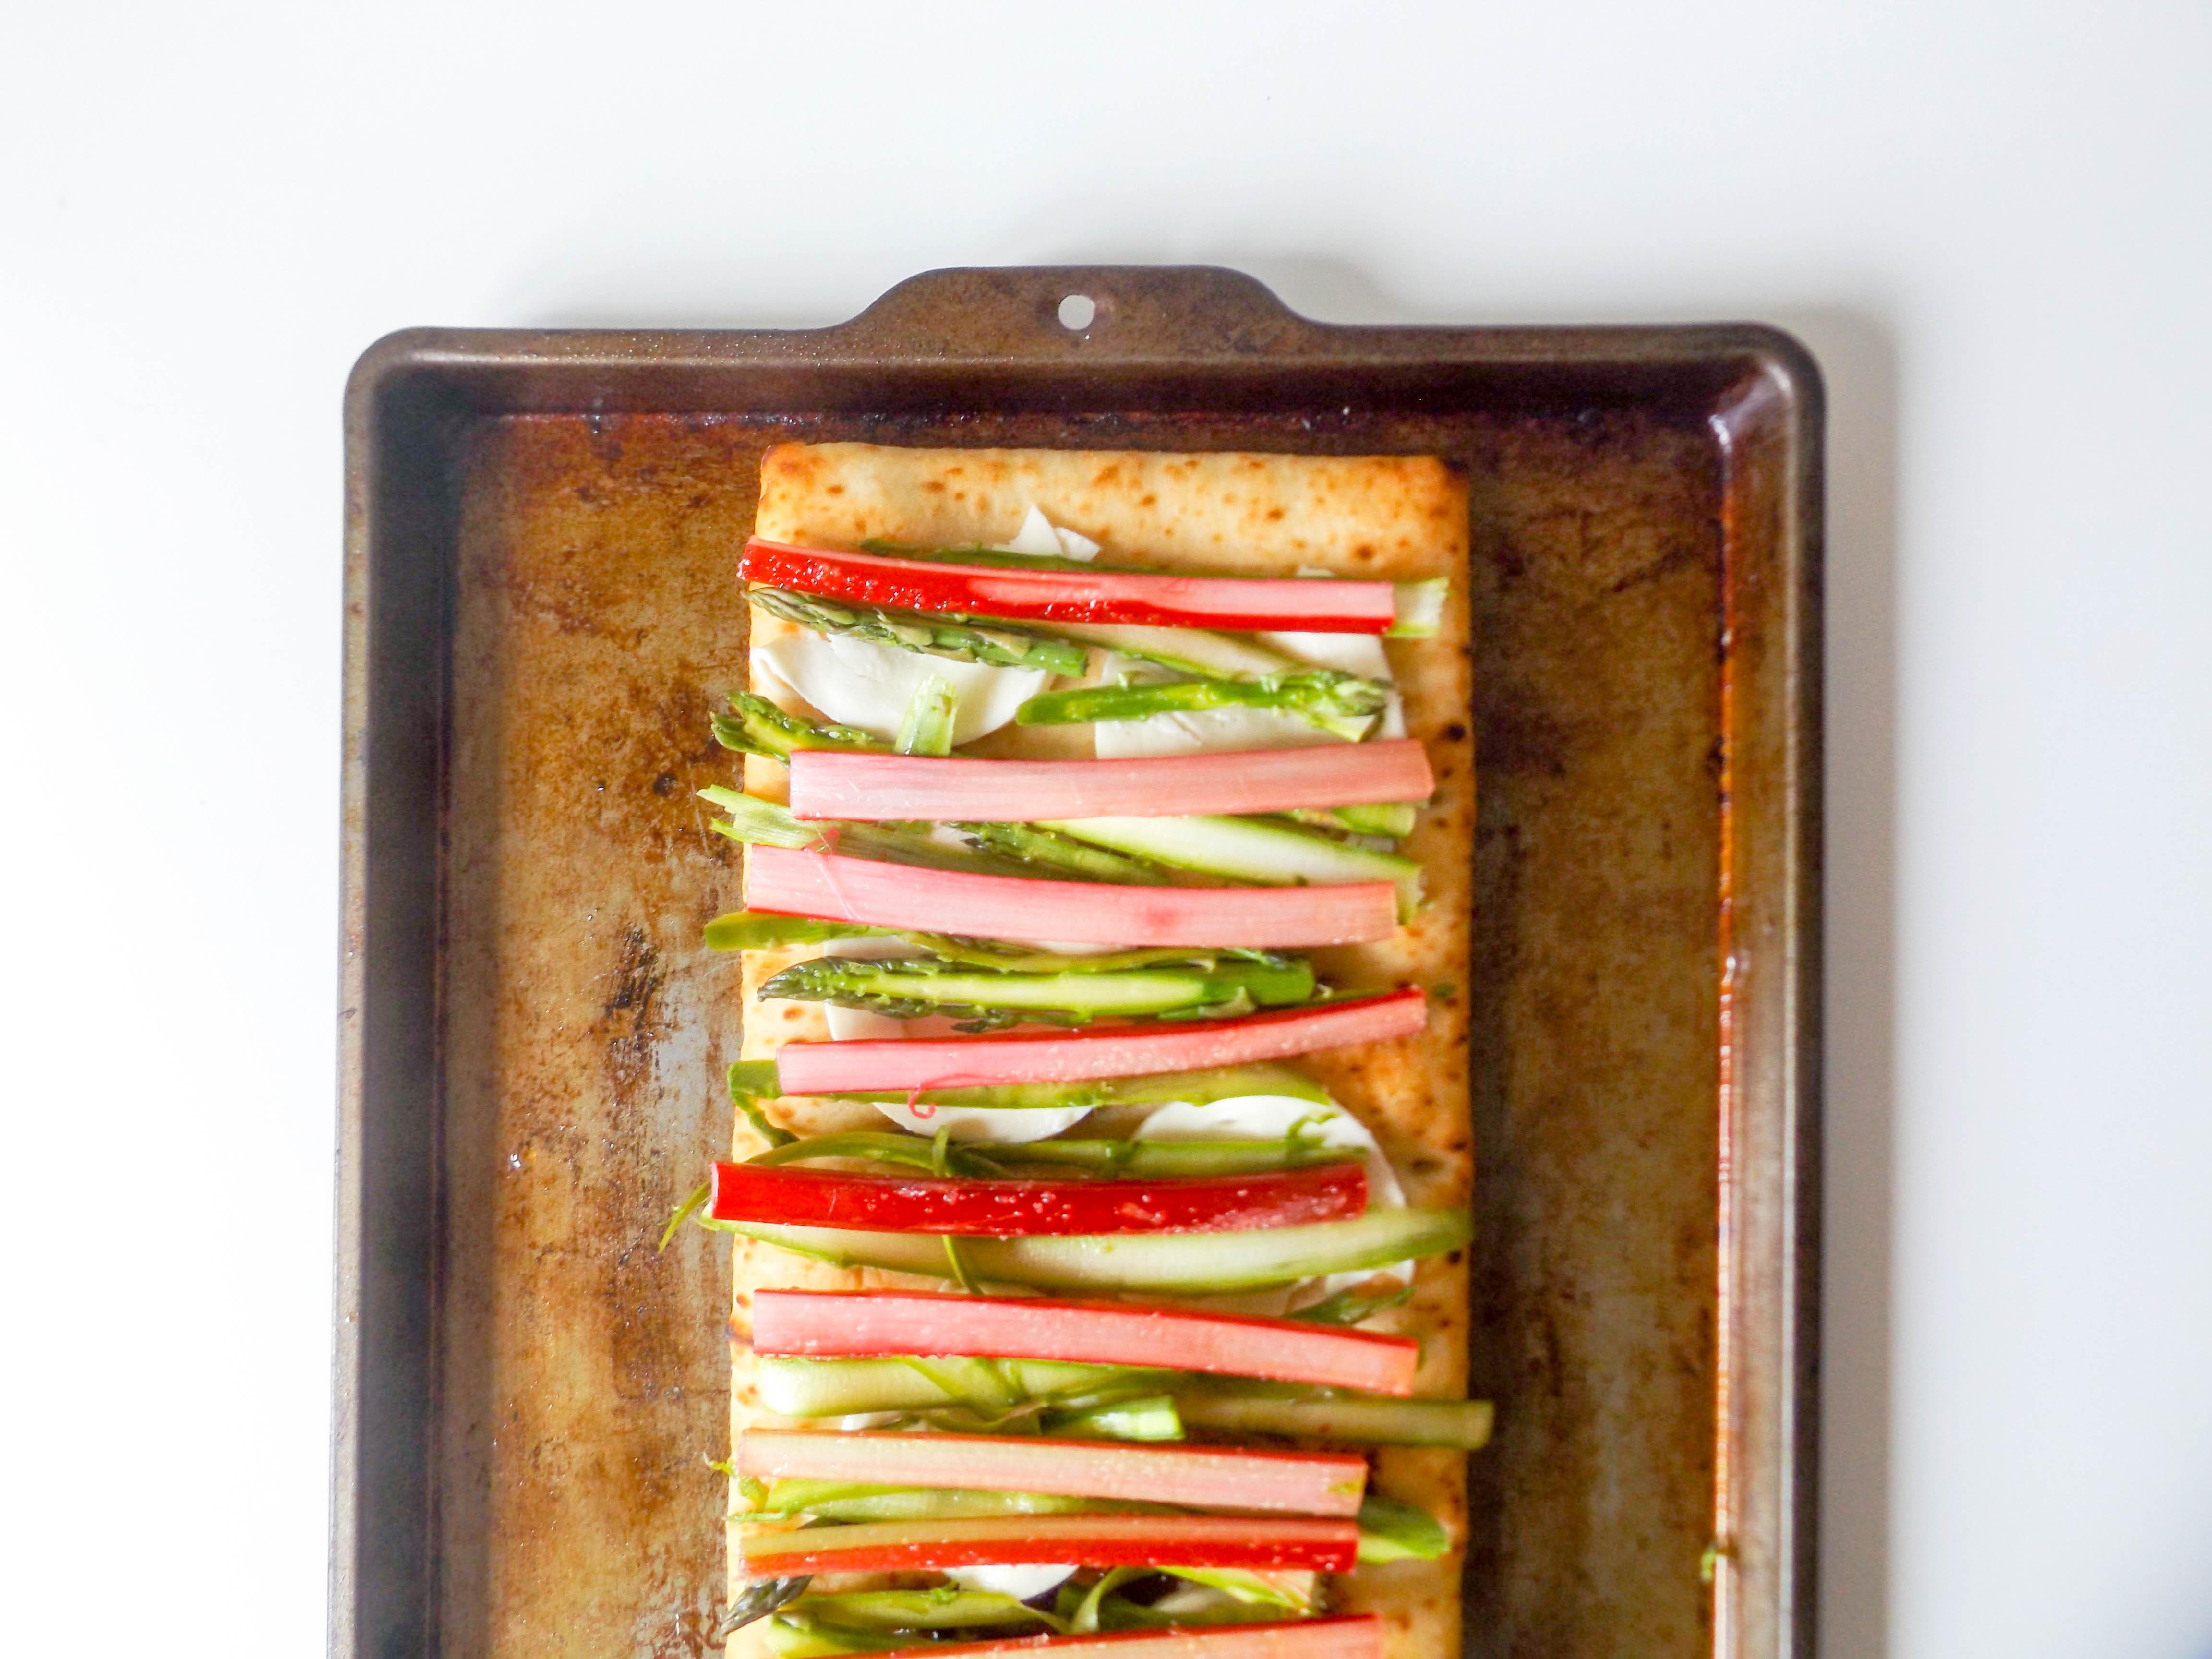 Rhubarb & Asparagus Flatbread Pizza